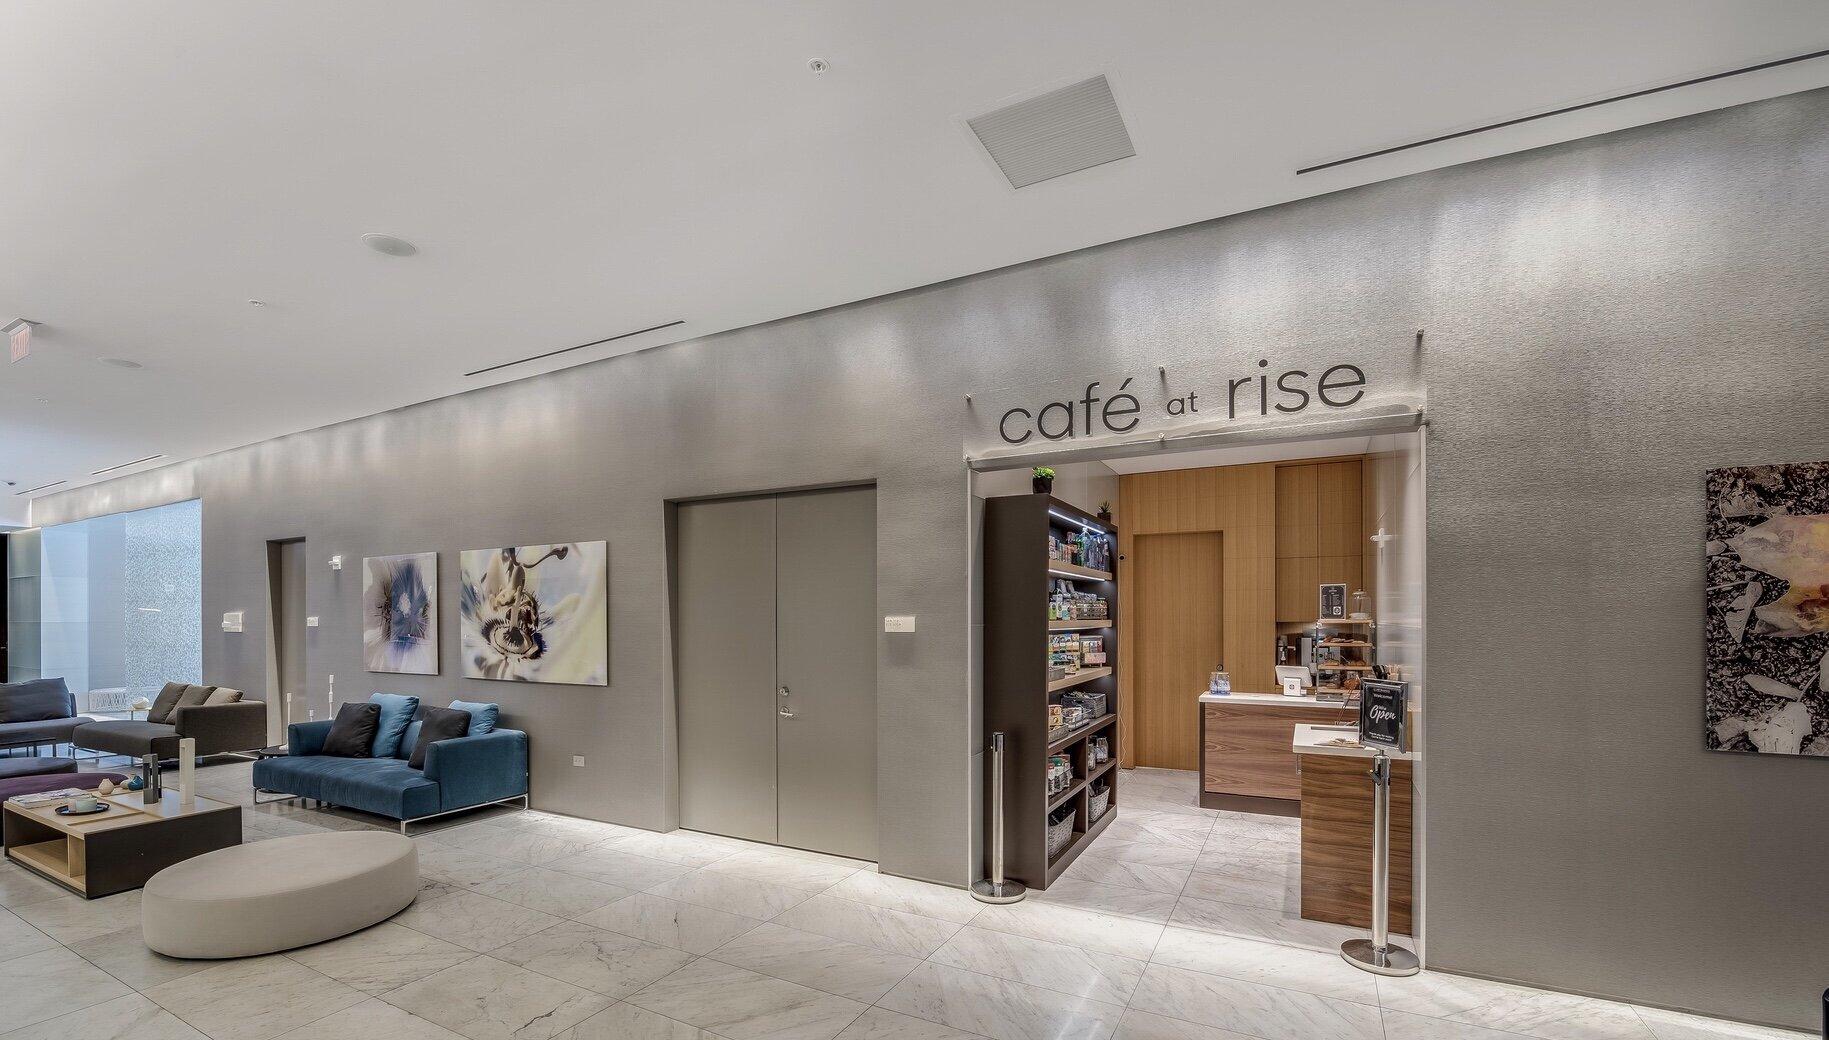 cafe-reach-rise-brickell-city-centre_lipstickandchicspaces.com.jpg